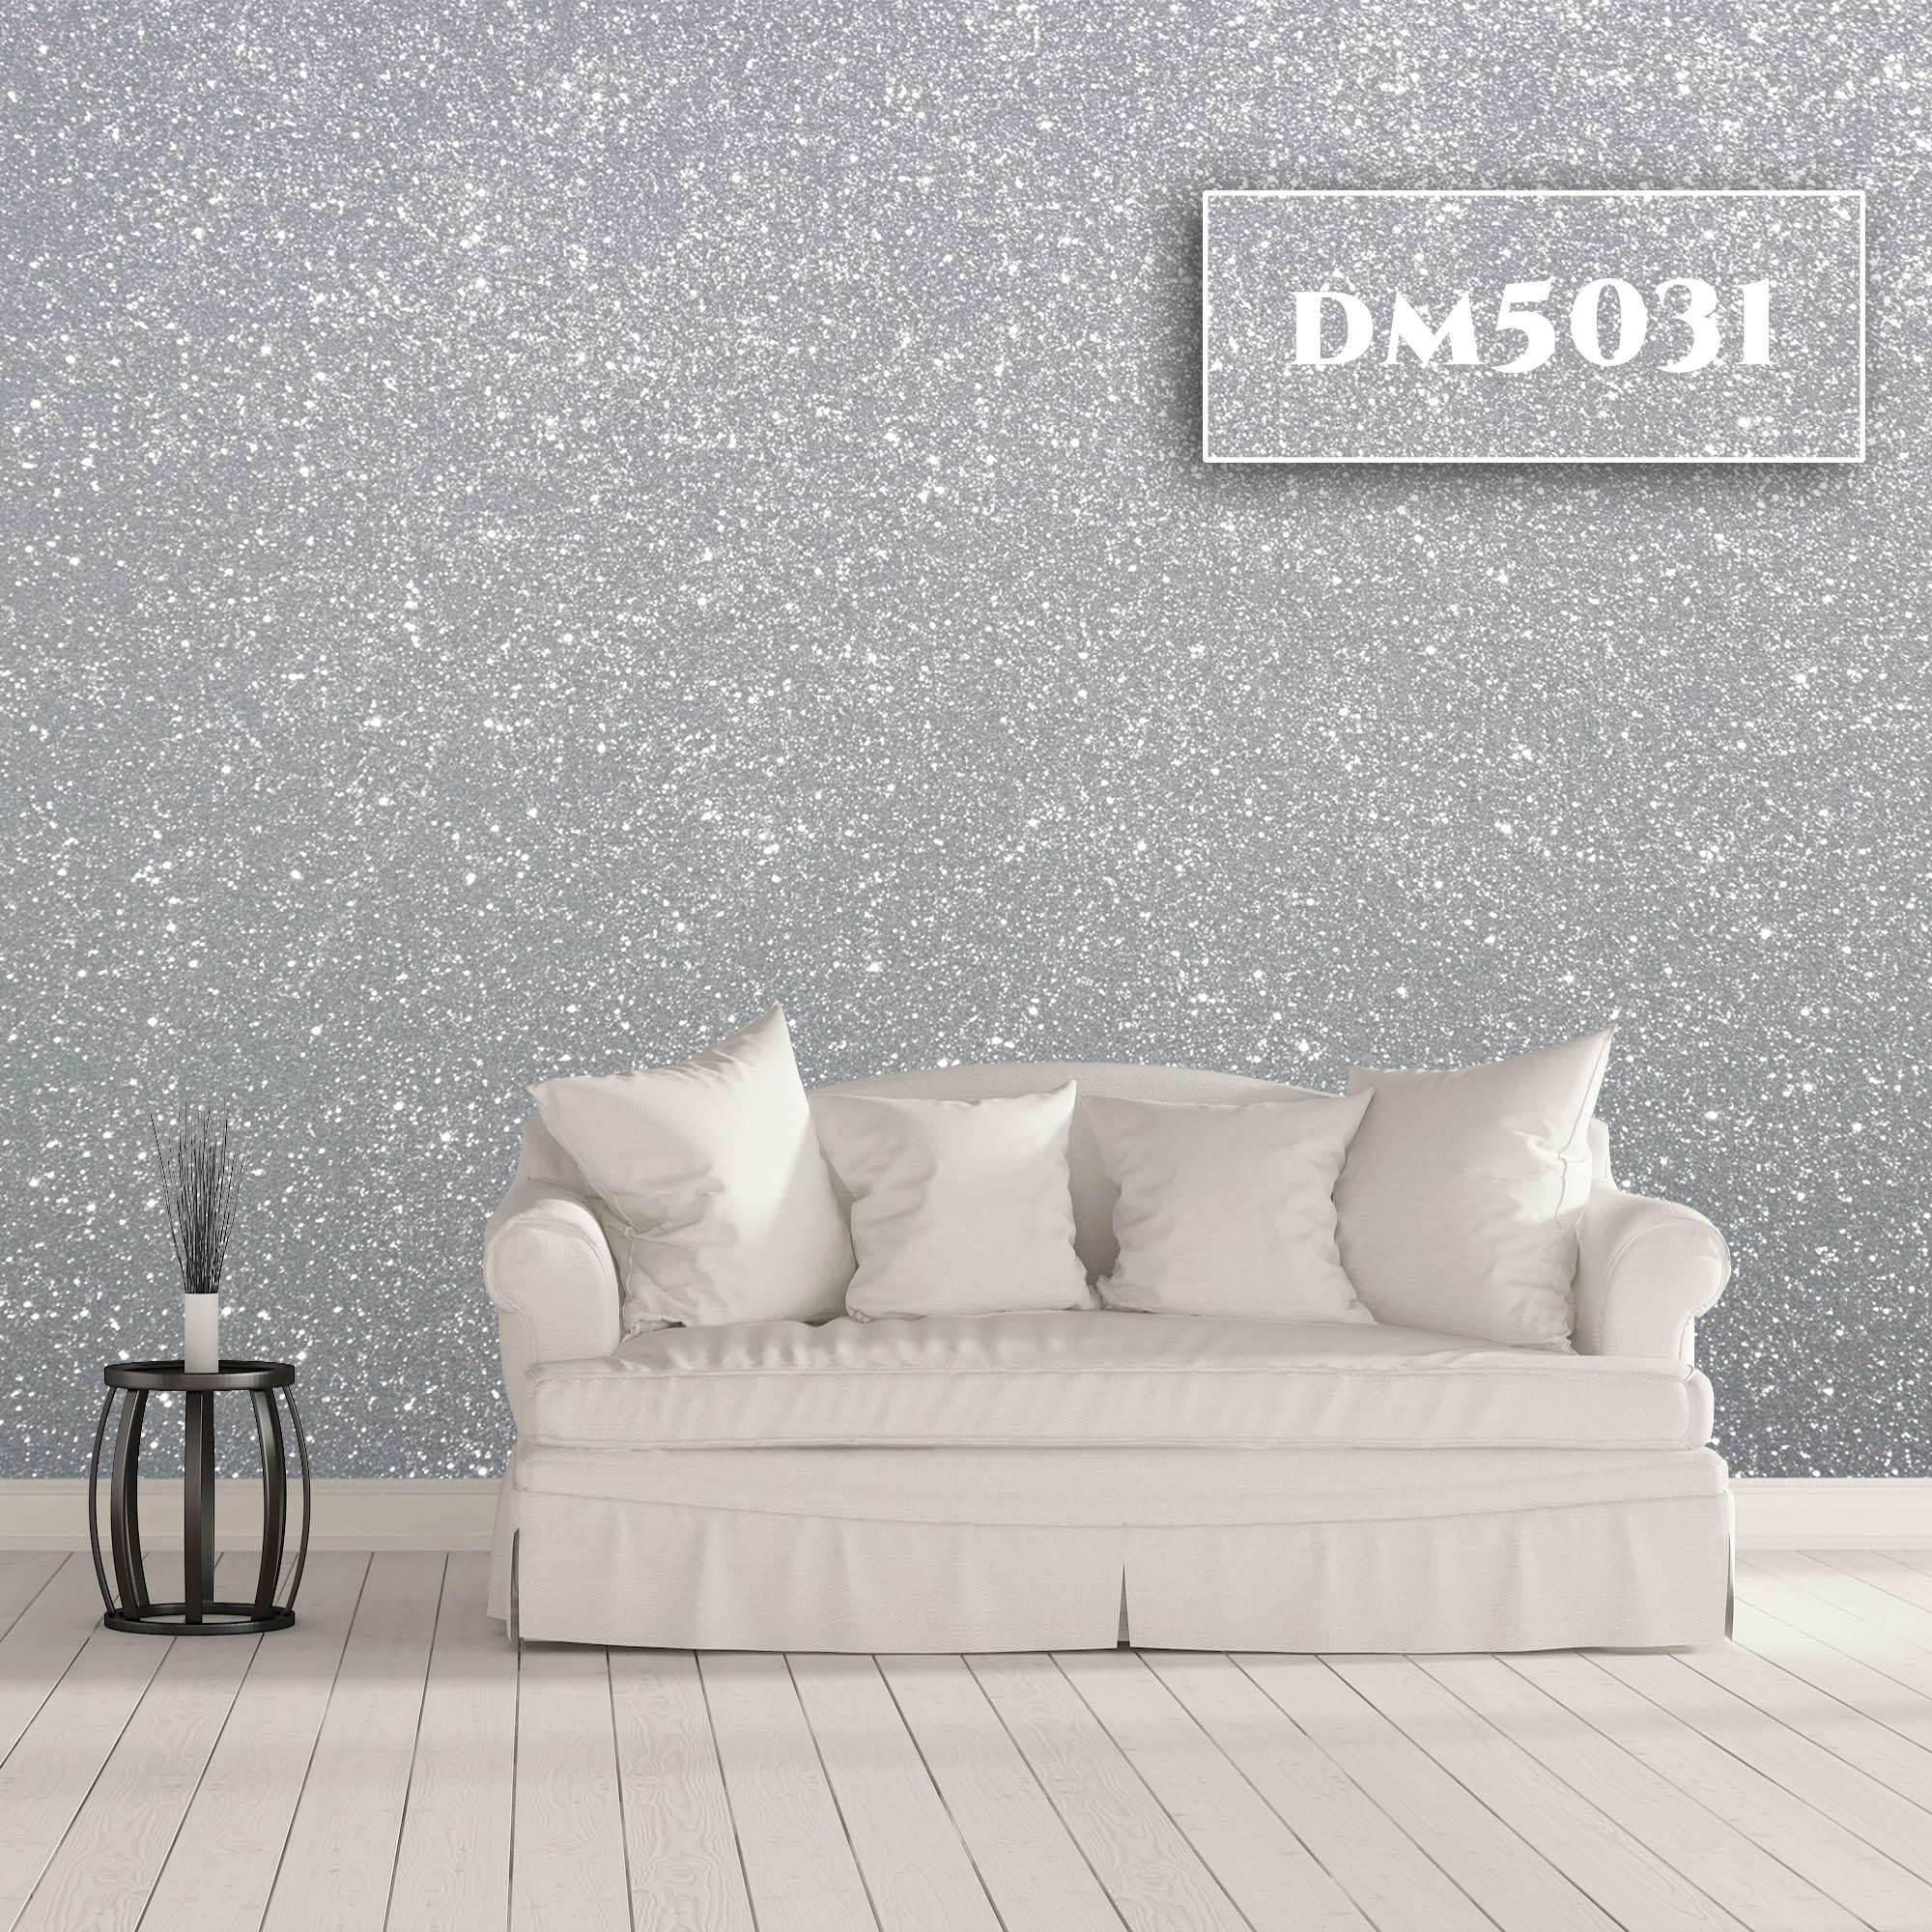 DM5031